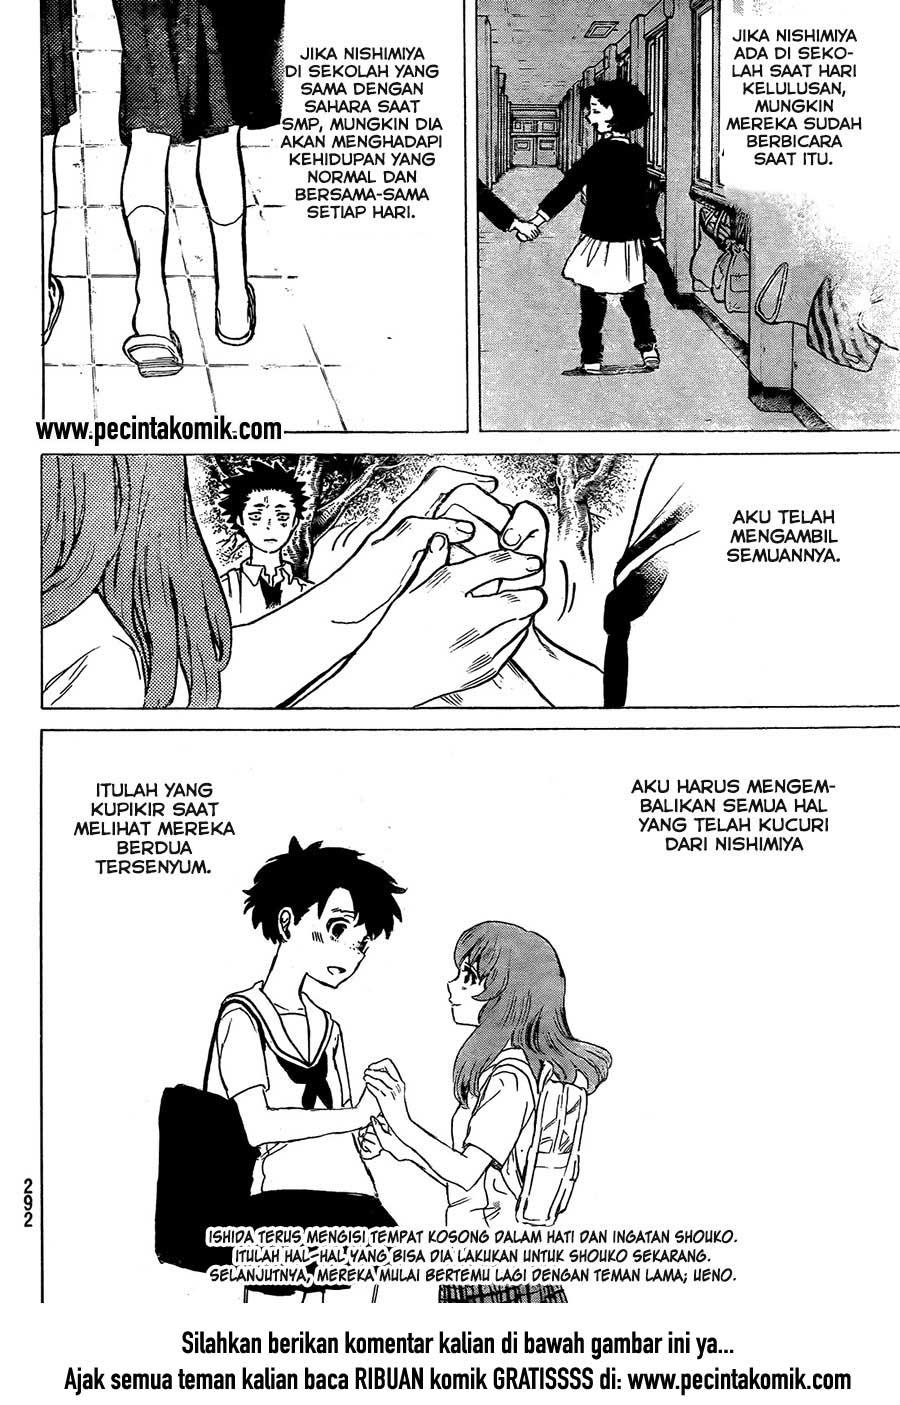 Koe no Katachi Chapter 16-21